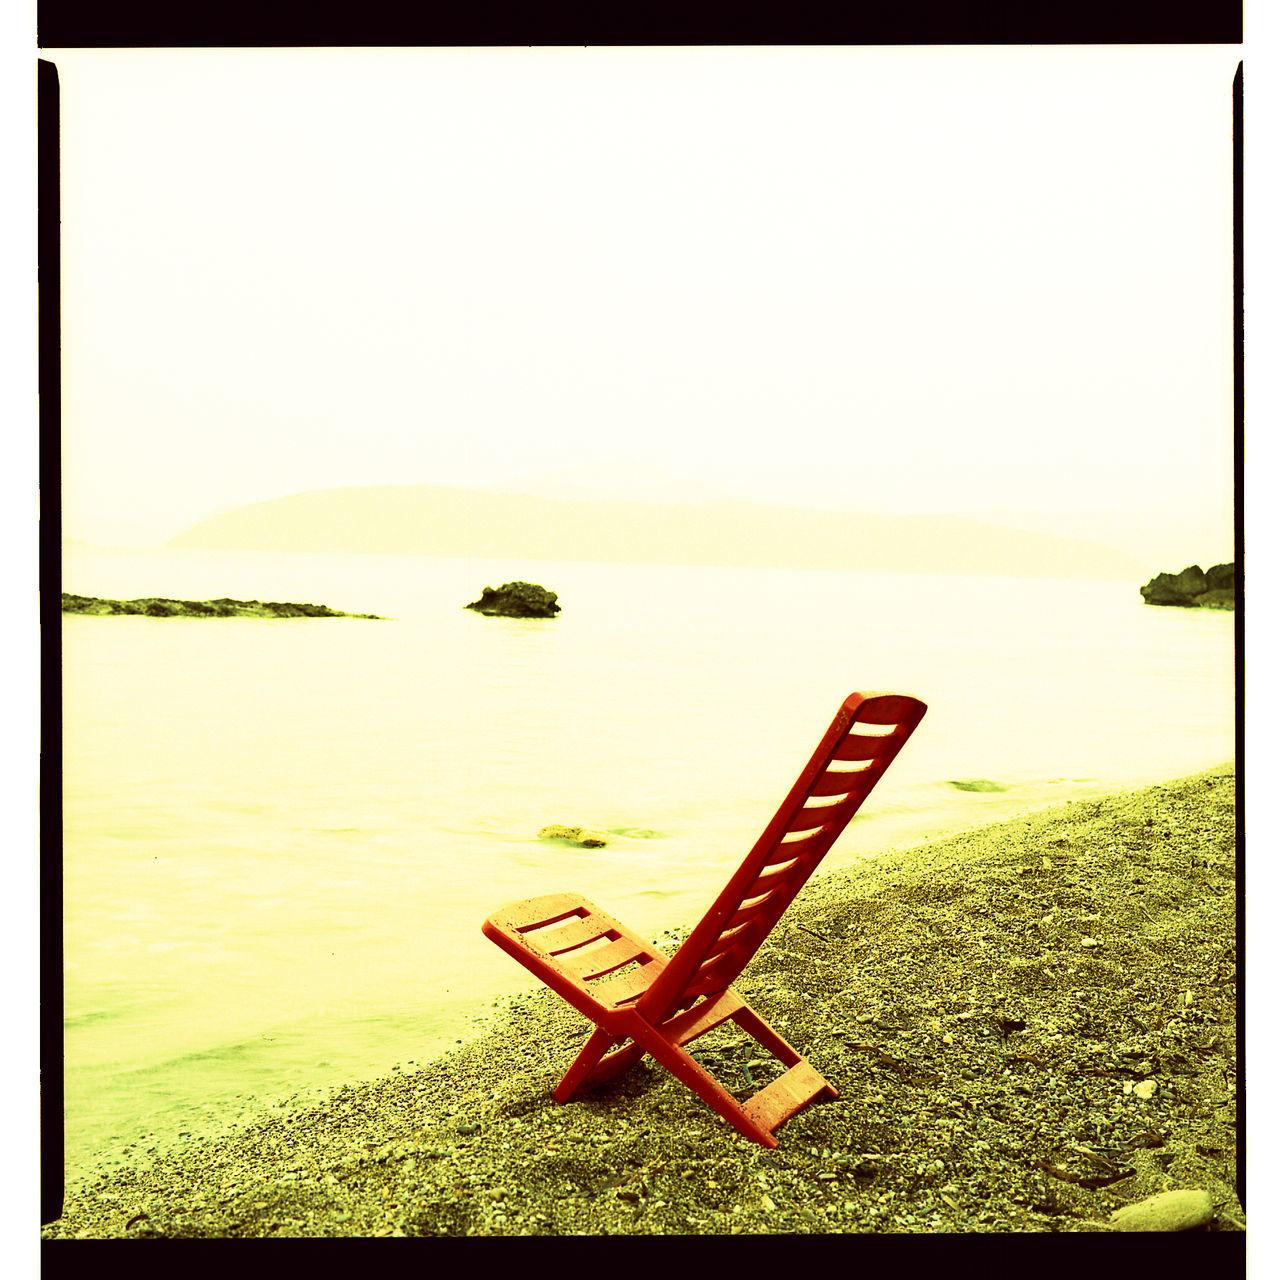 6x6 Beachchair Chair Film Photography Mediterranean Sea Sea Seaside Strange Colors